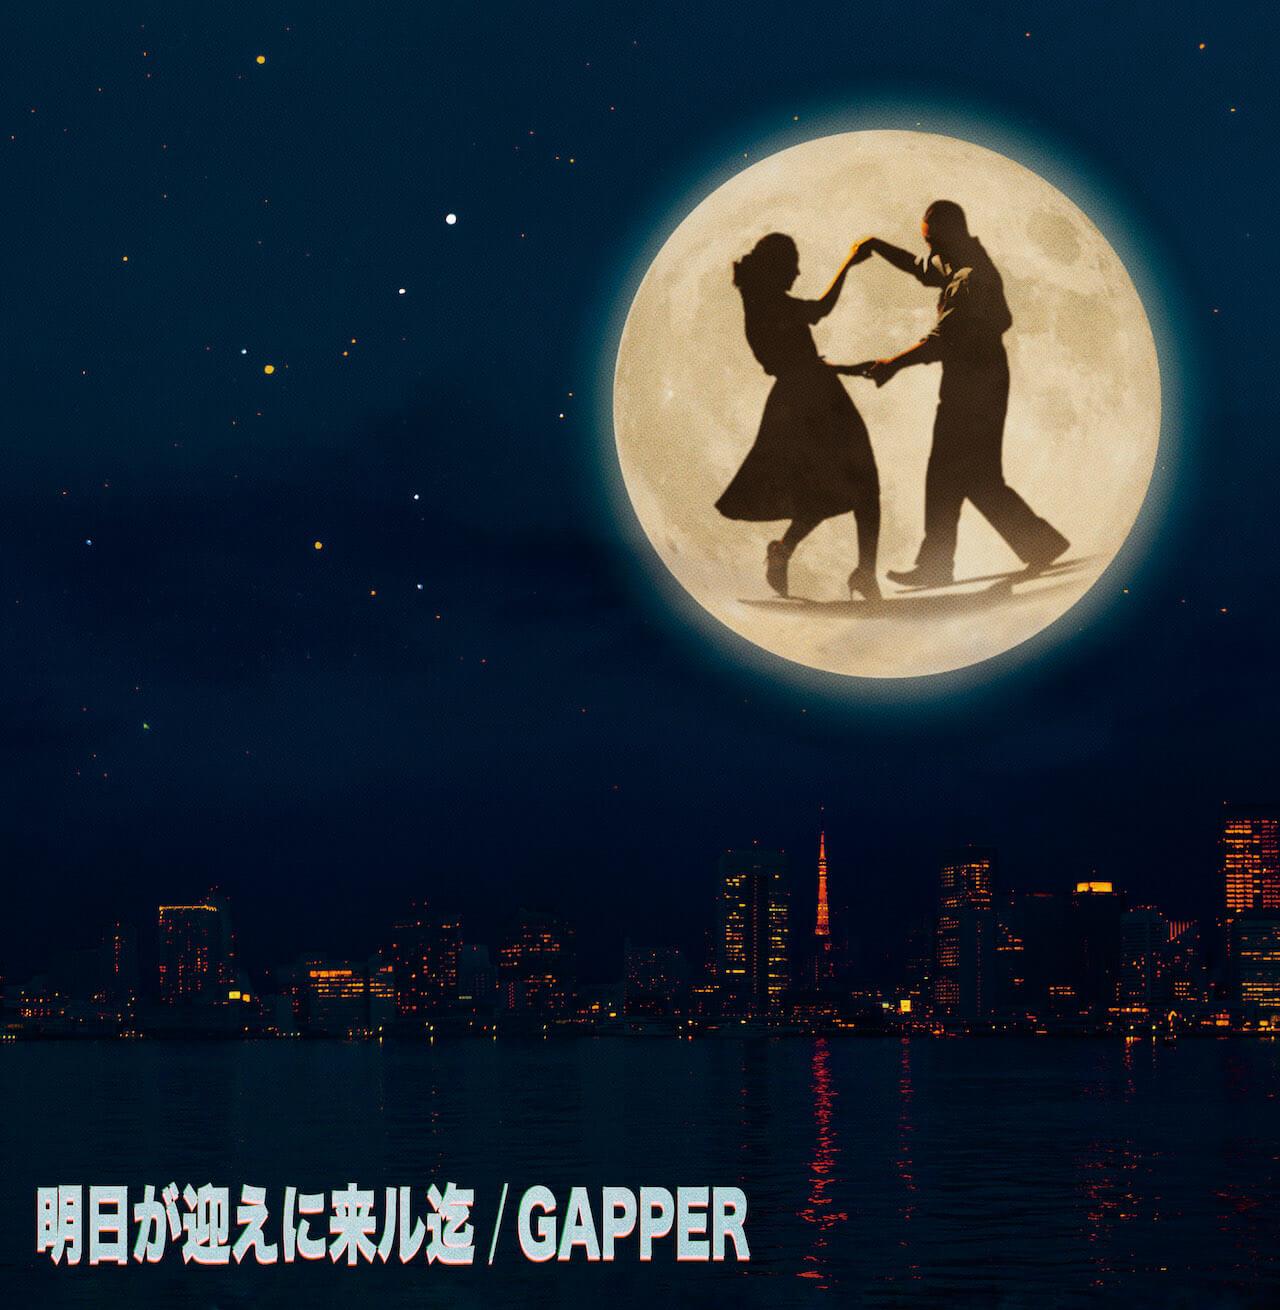 GAPPER、ついにソロ・デビューアルバムが完成 プロデュースは5lack、客演にDaichi Yamamotoら music210714-gapper-1